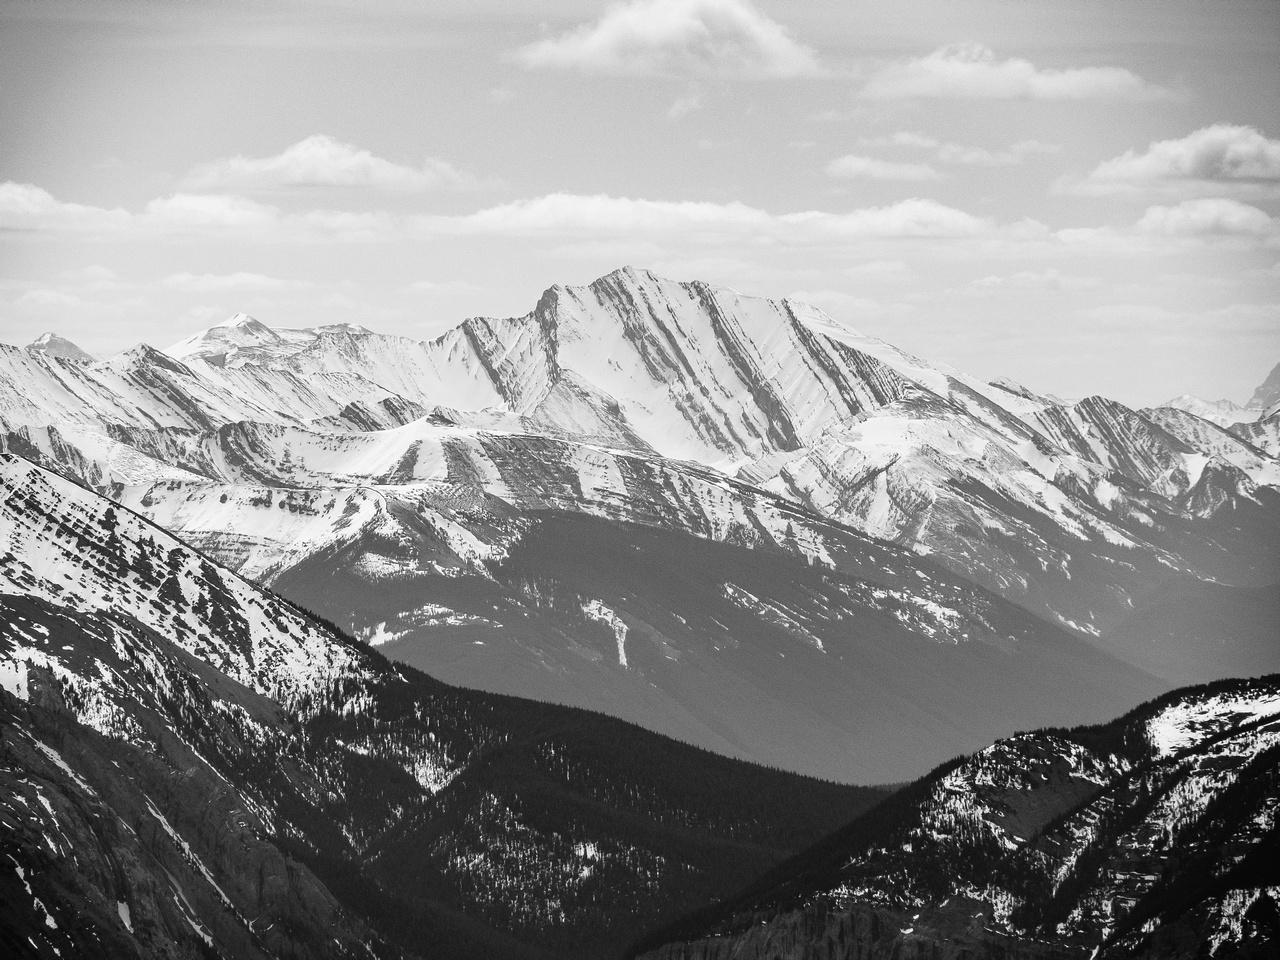 Fisher Peak is still a favorite scramble of mine.